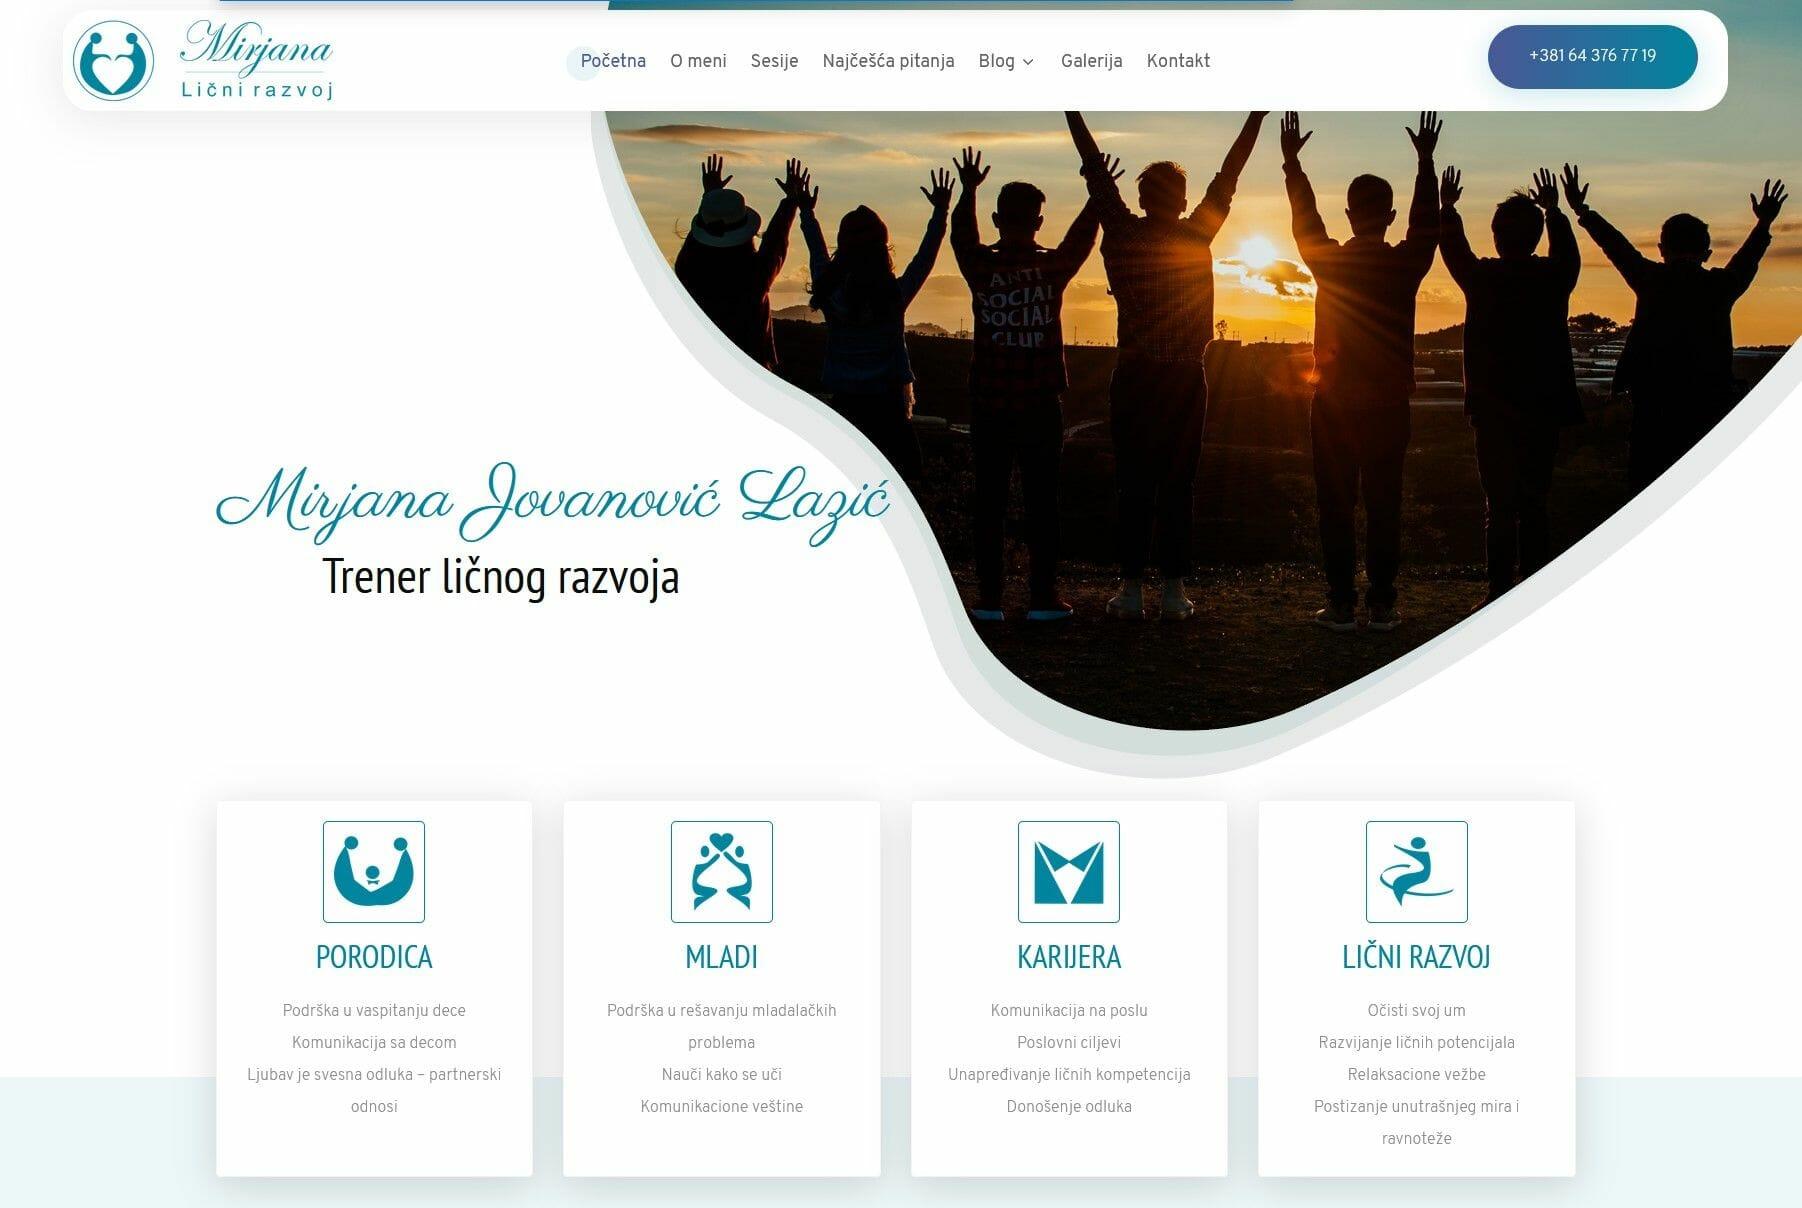 sajt za life coach-a